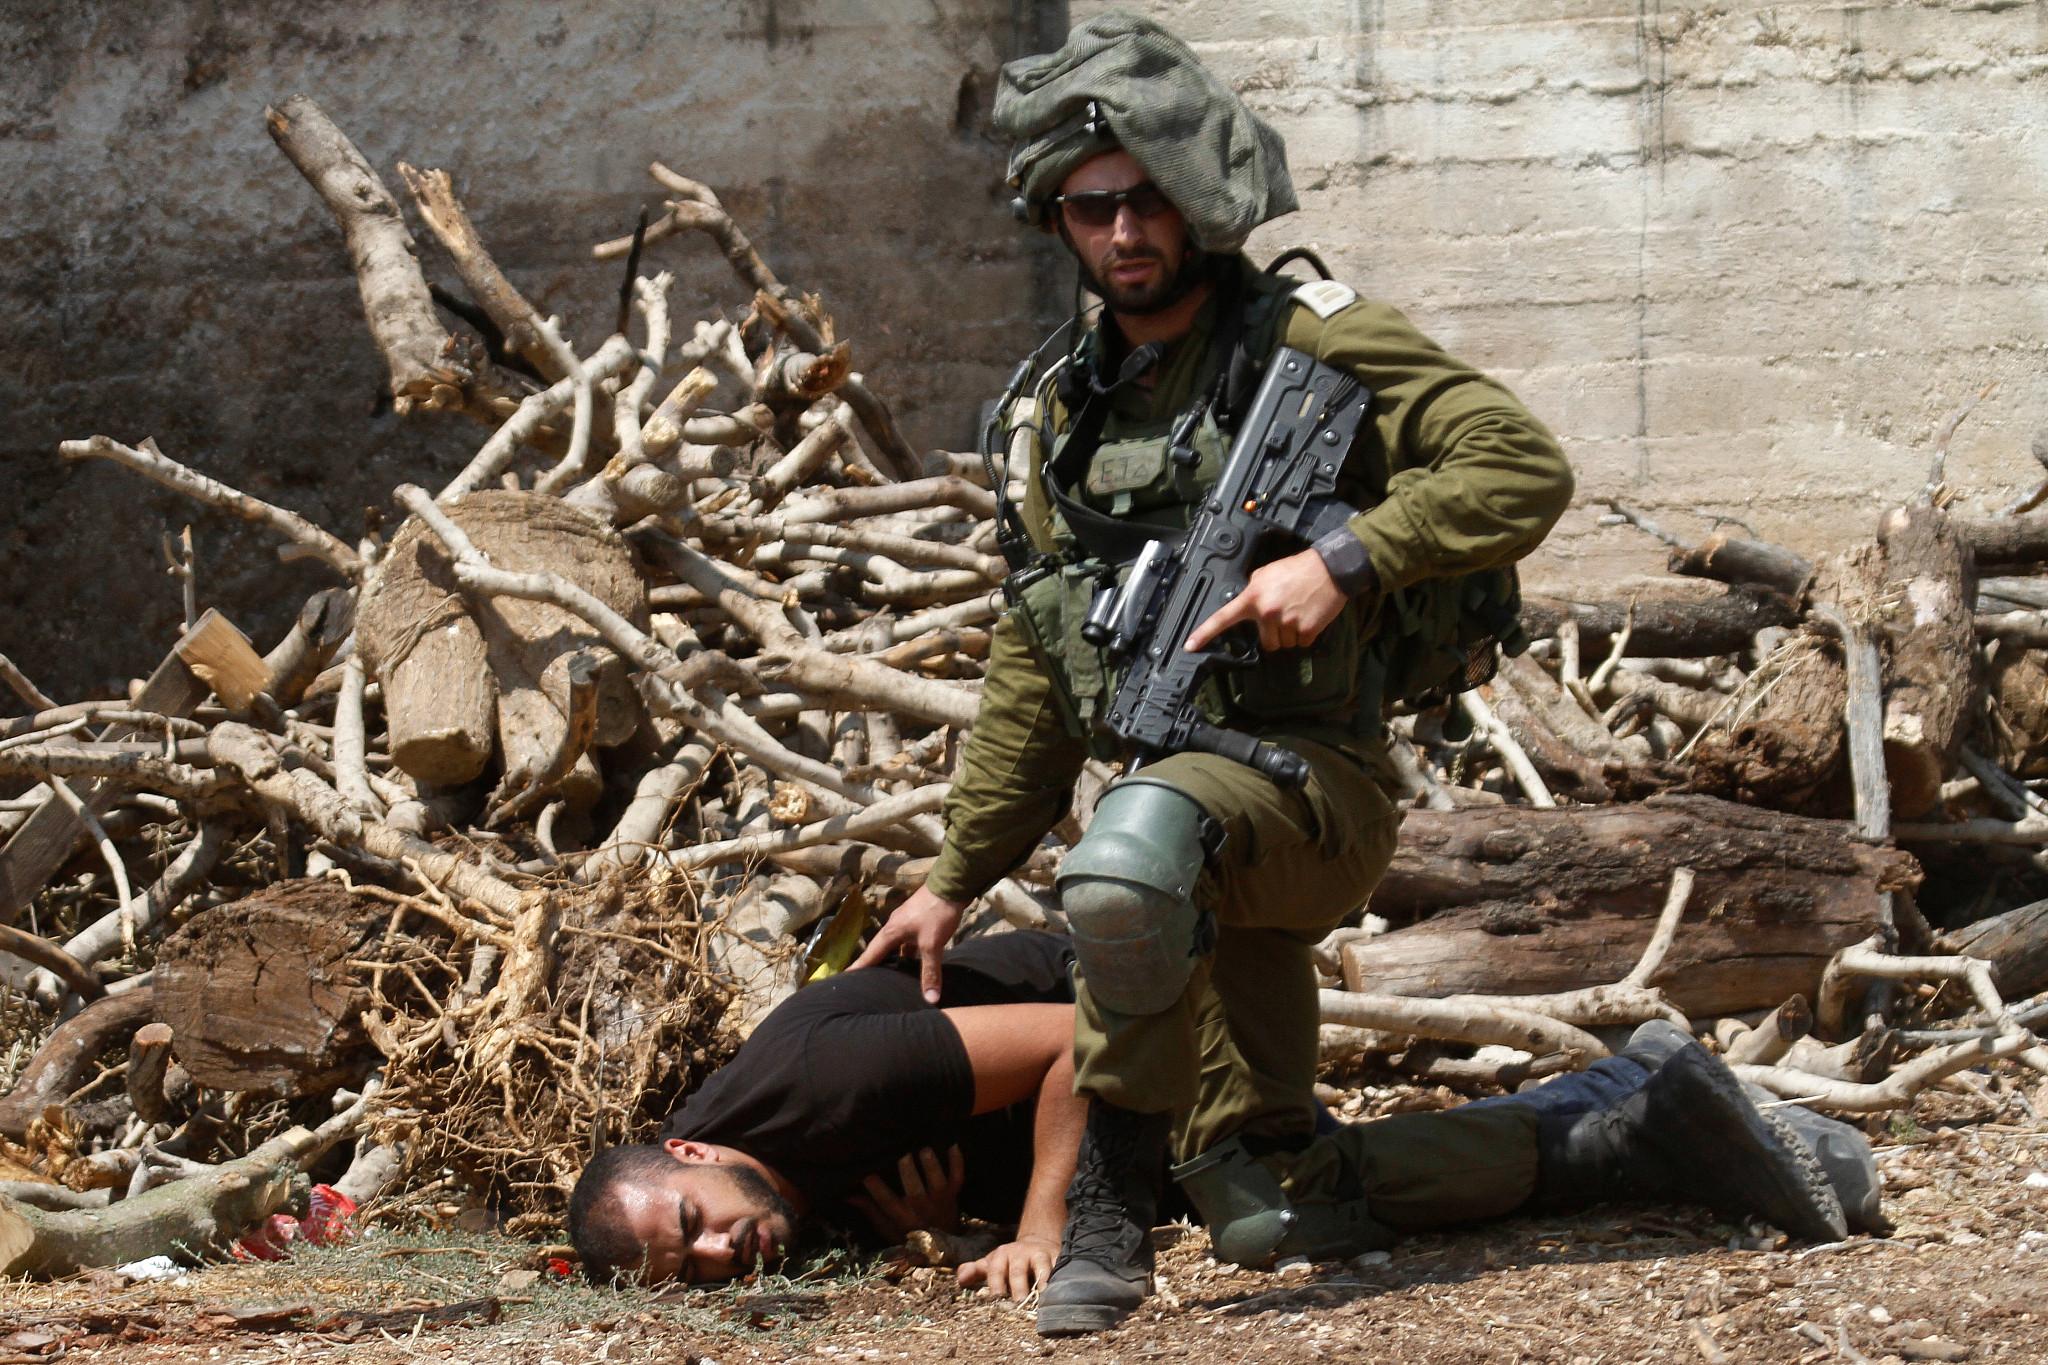 An Israeli soldier kneels over a Palestinian protester in the village of Kfar Qaddum, near Nablus, West Bank August 23, 2019. (Nasser Ishtayeh/Flash90)